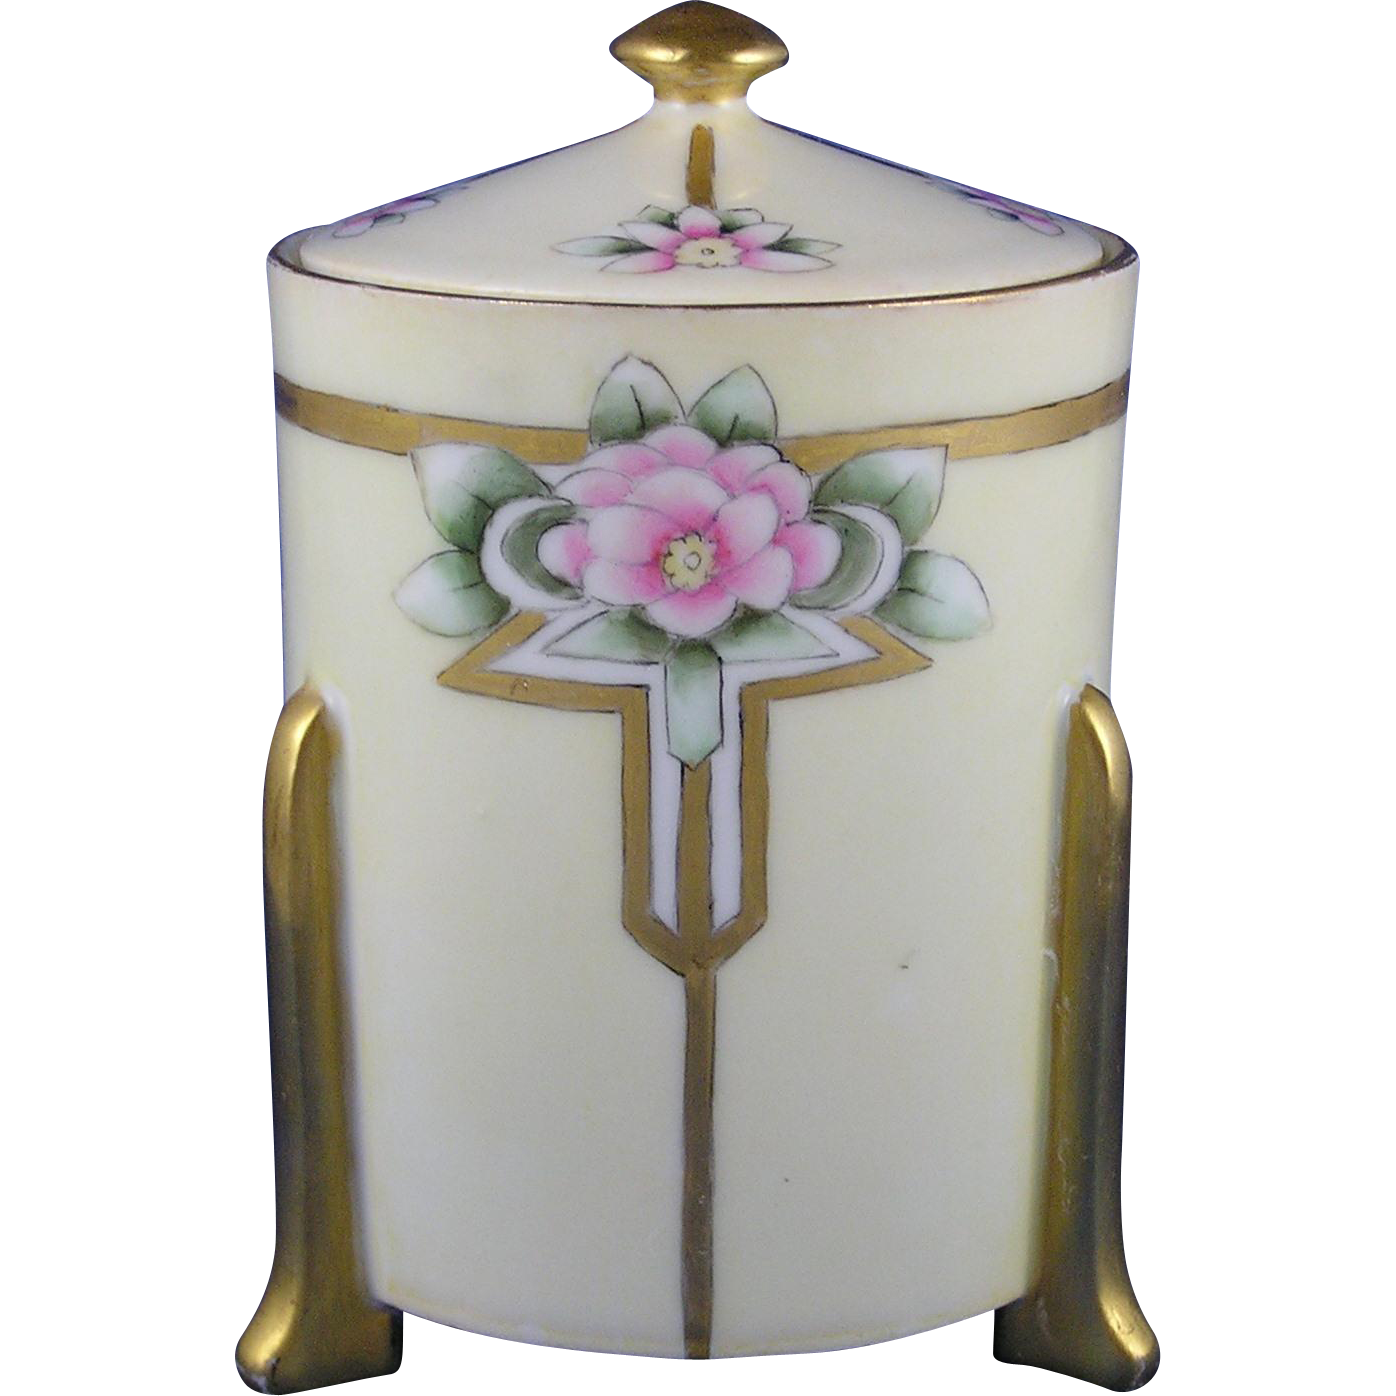 Thomas Bavaria Arts & Crafts Floral Motif Jam/Jelly Jar (c.1908-1925)